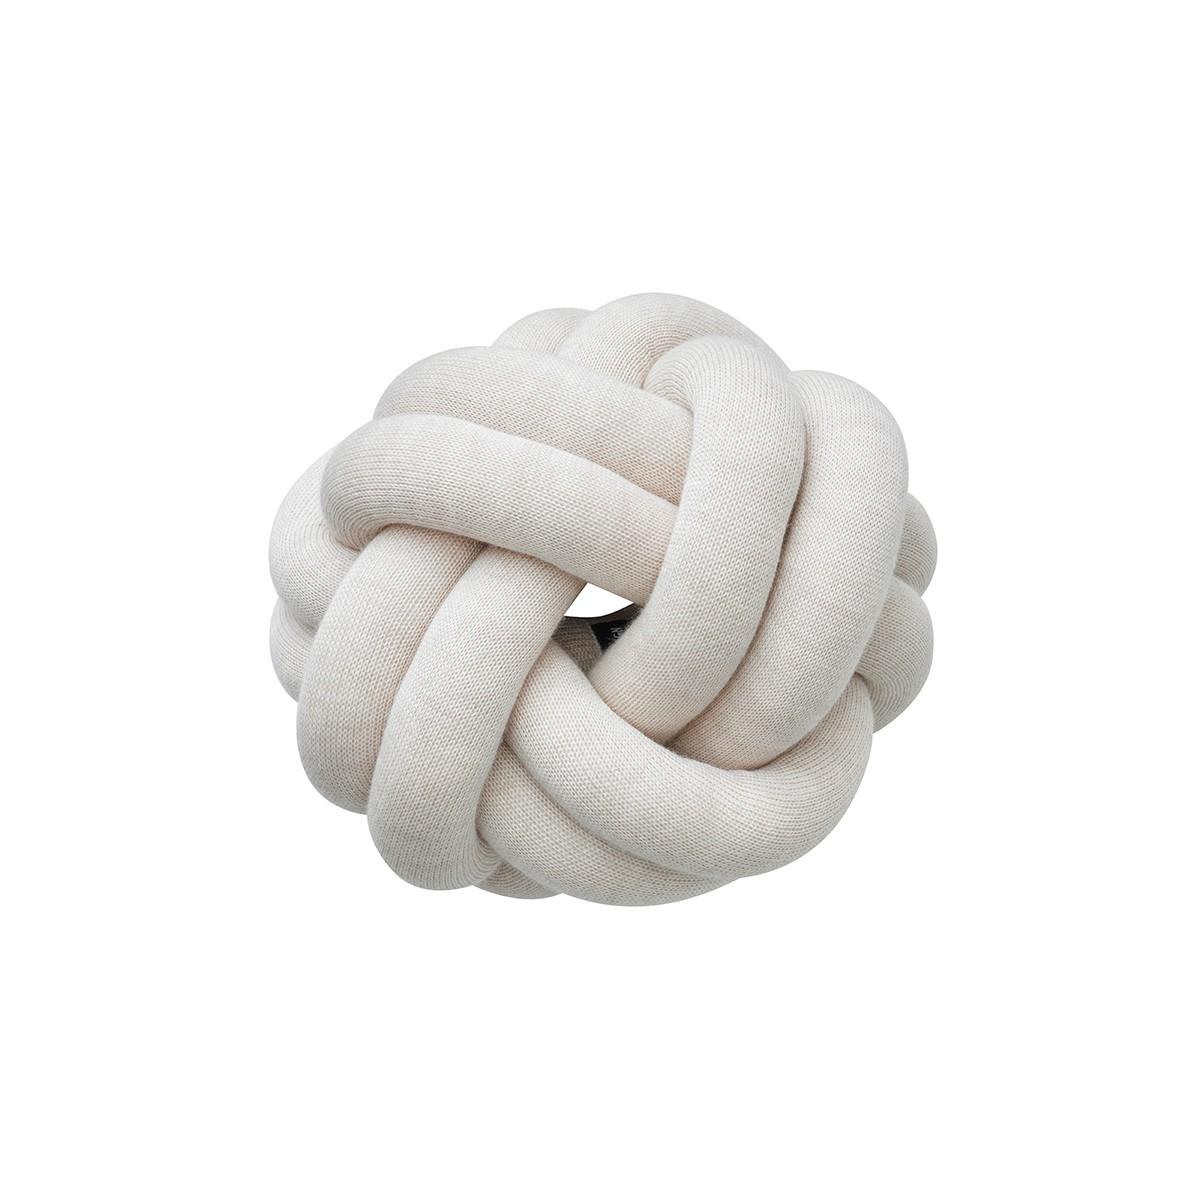 Design House Stockholm I Knot Cushion | Cream